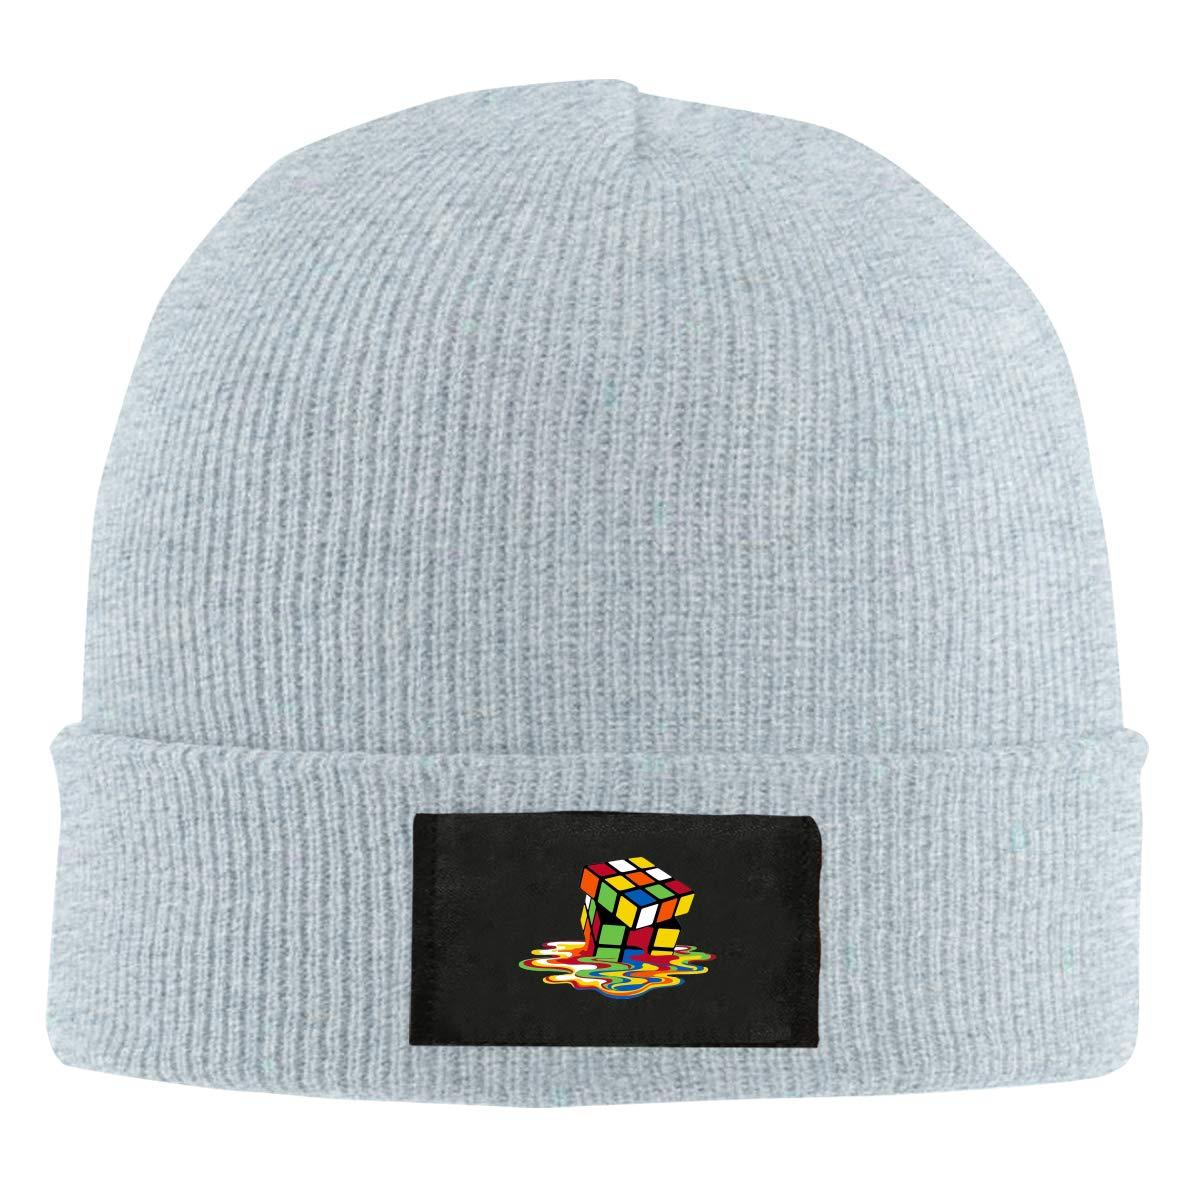 Melting Puzzle Cube Winter Beanie Hat Knit Skull Cap for Men /& Women